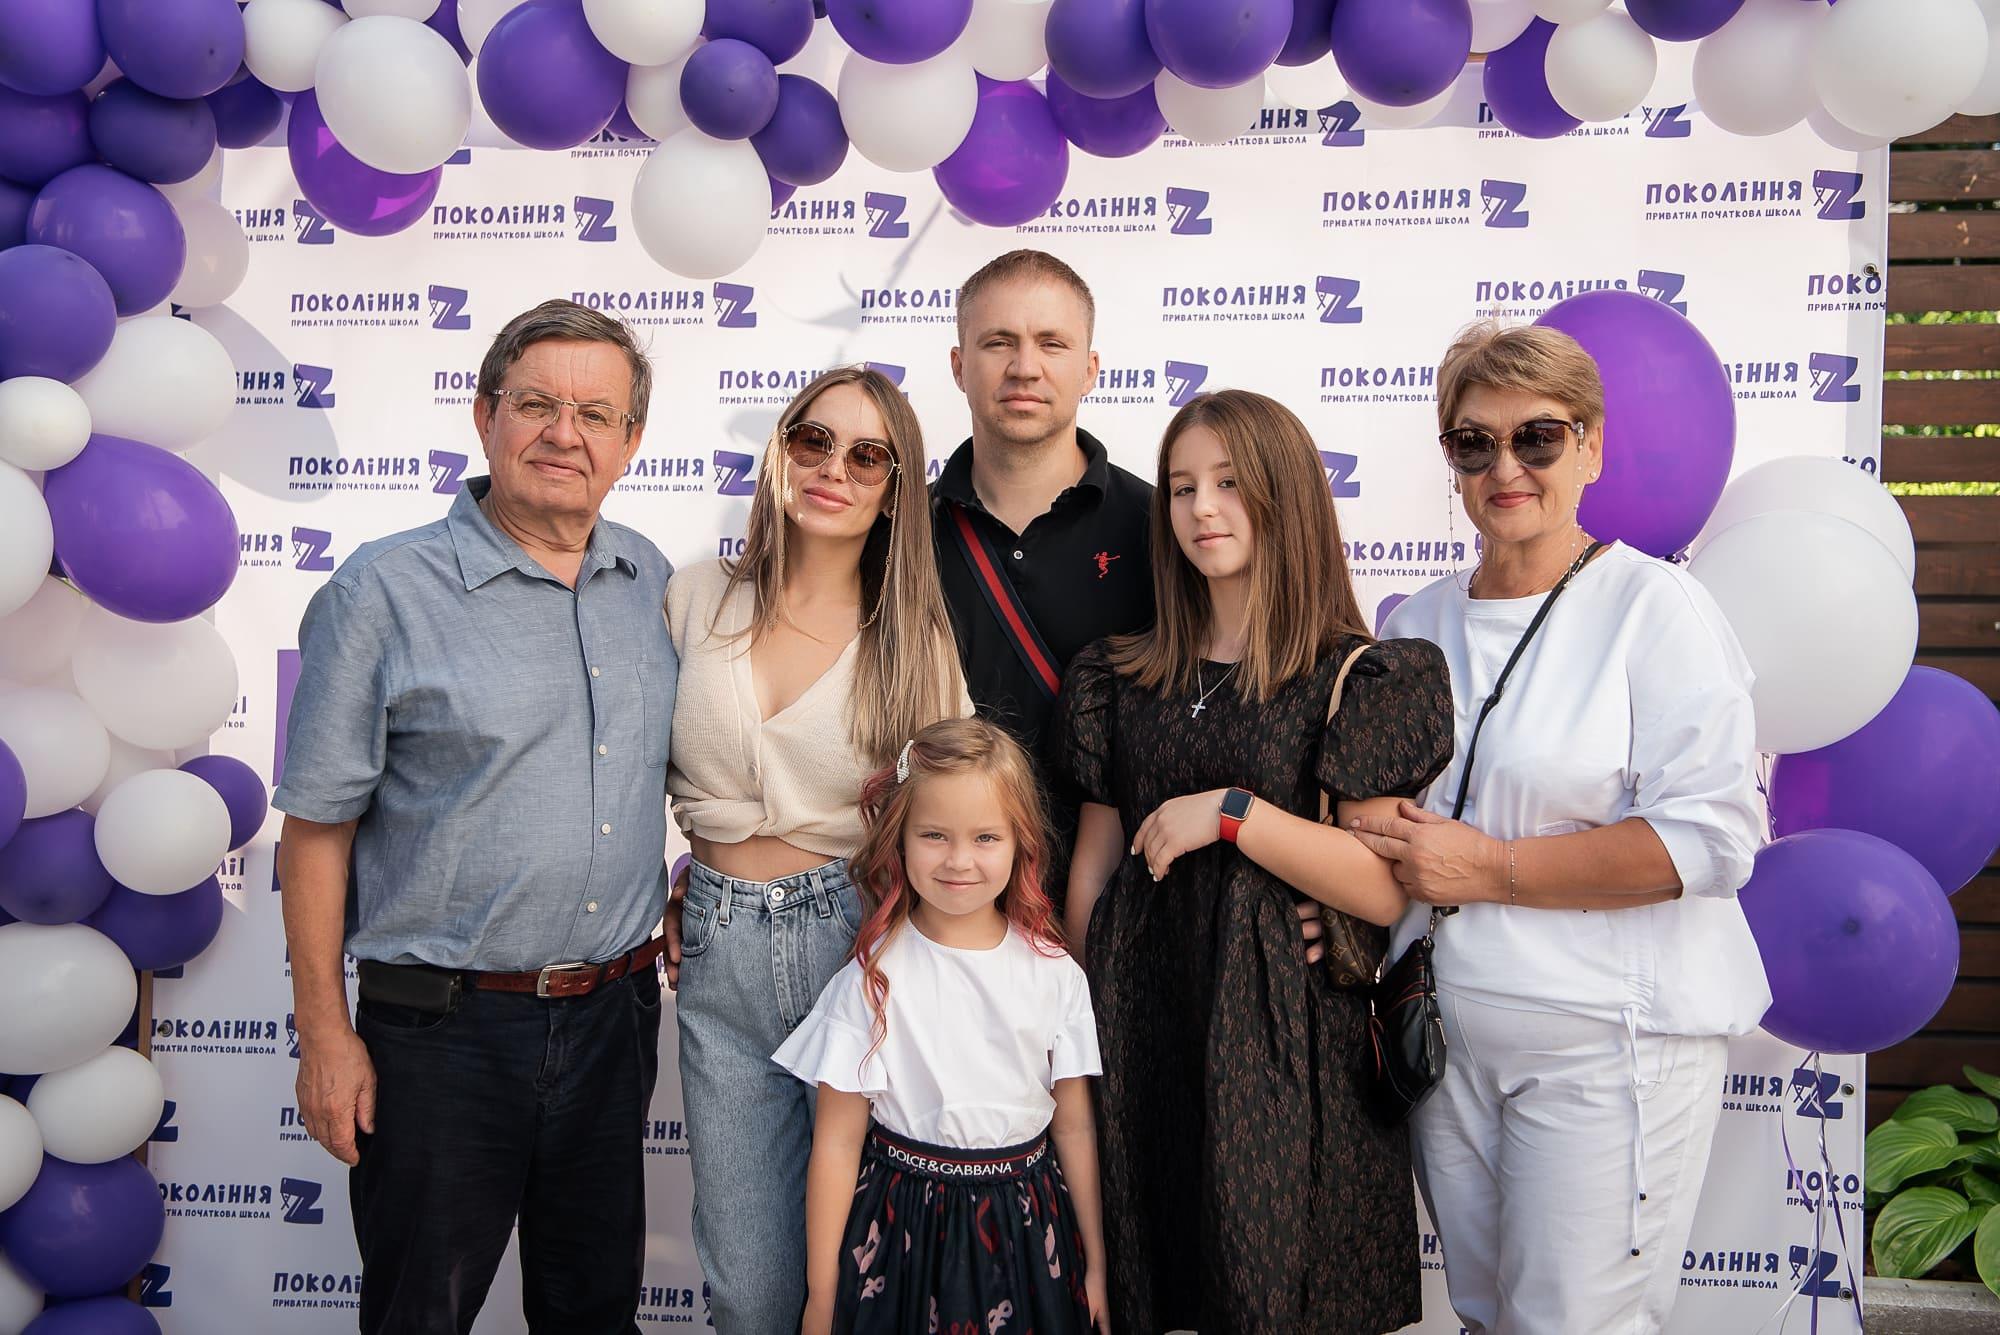 https://akademia-detstva.od.ua/app/uploads/2021/09/98.jpg